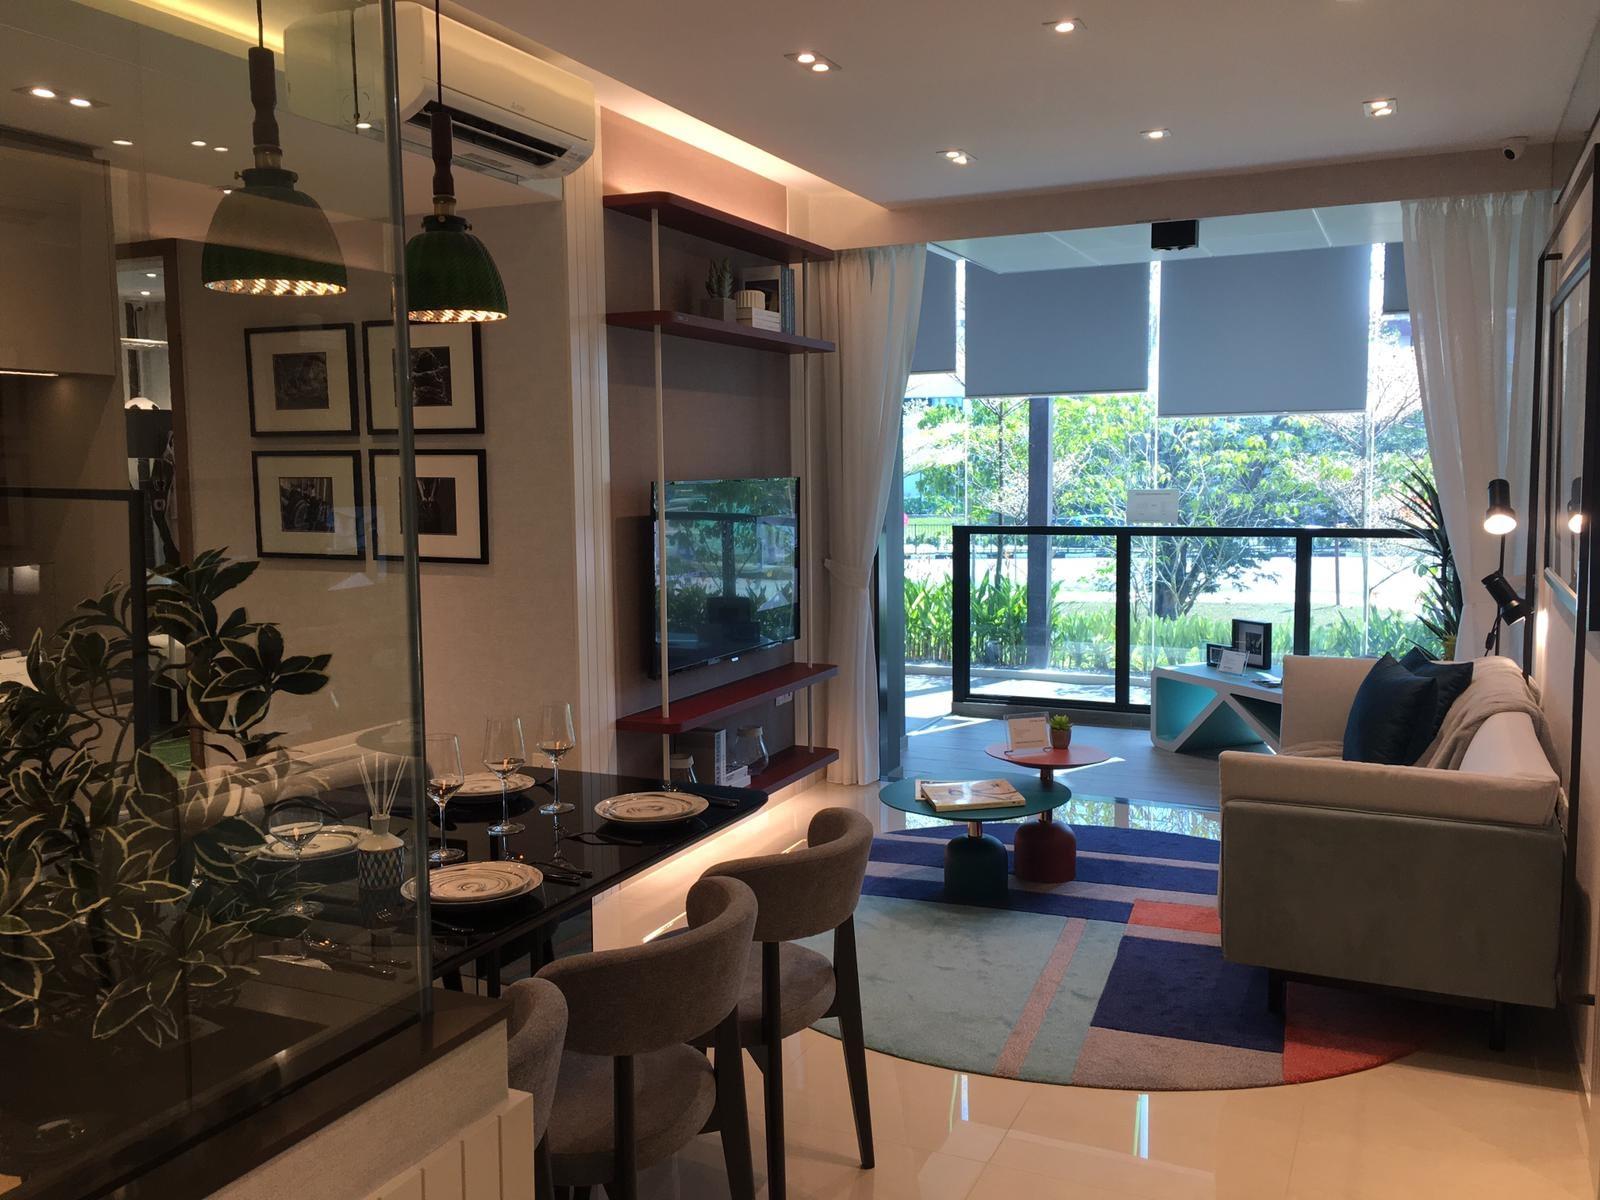 whistler grand living room overview